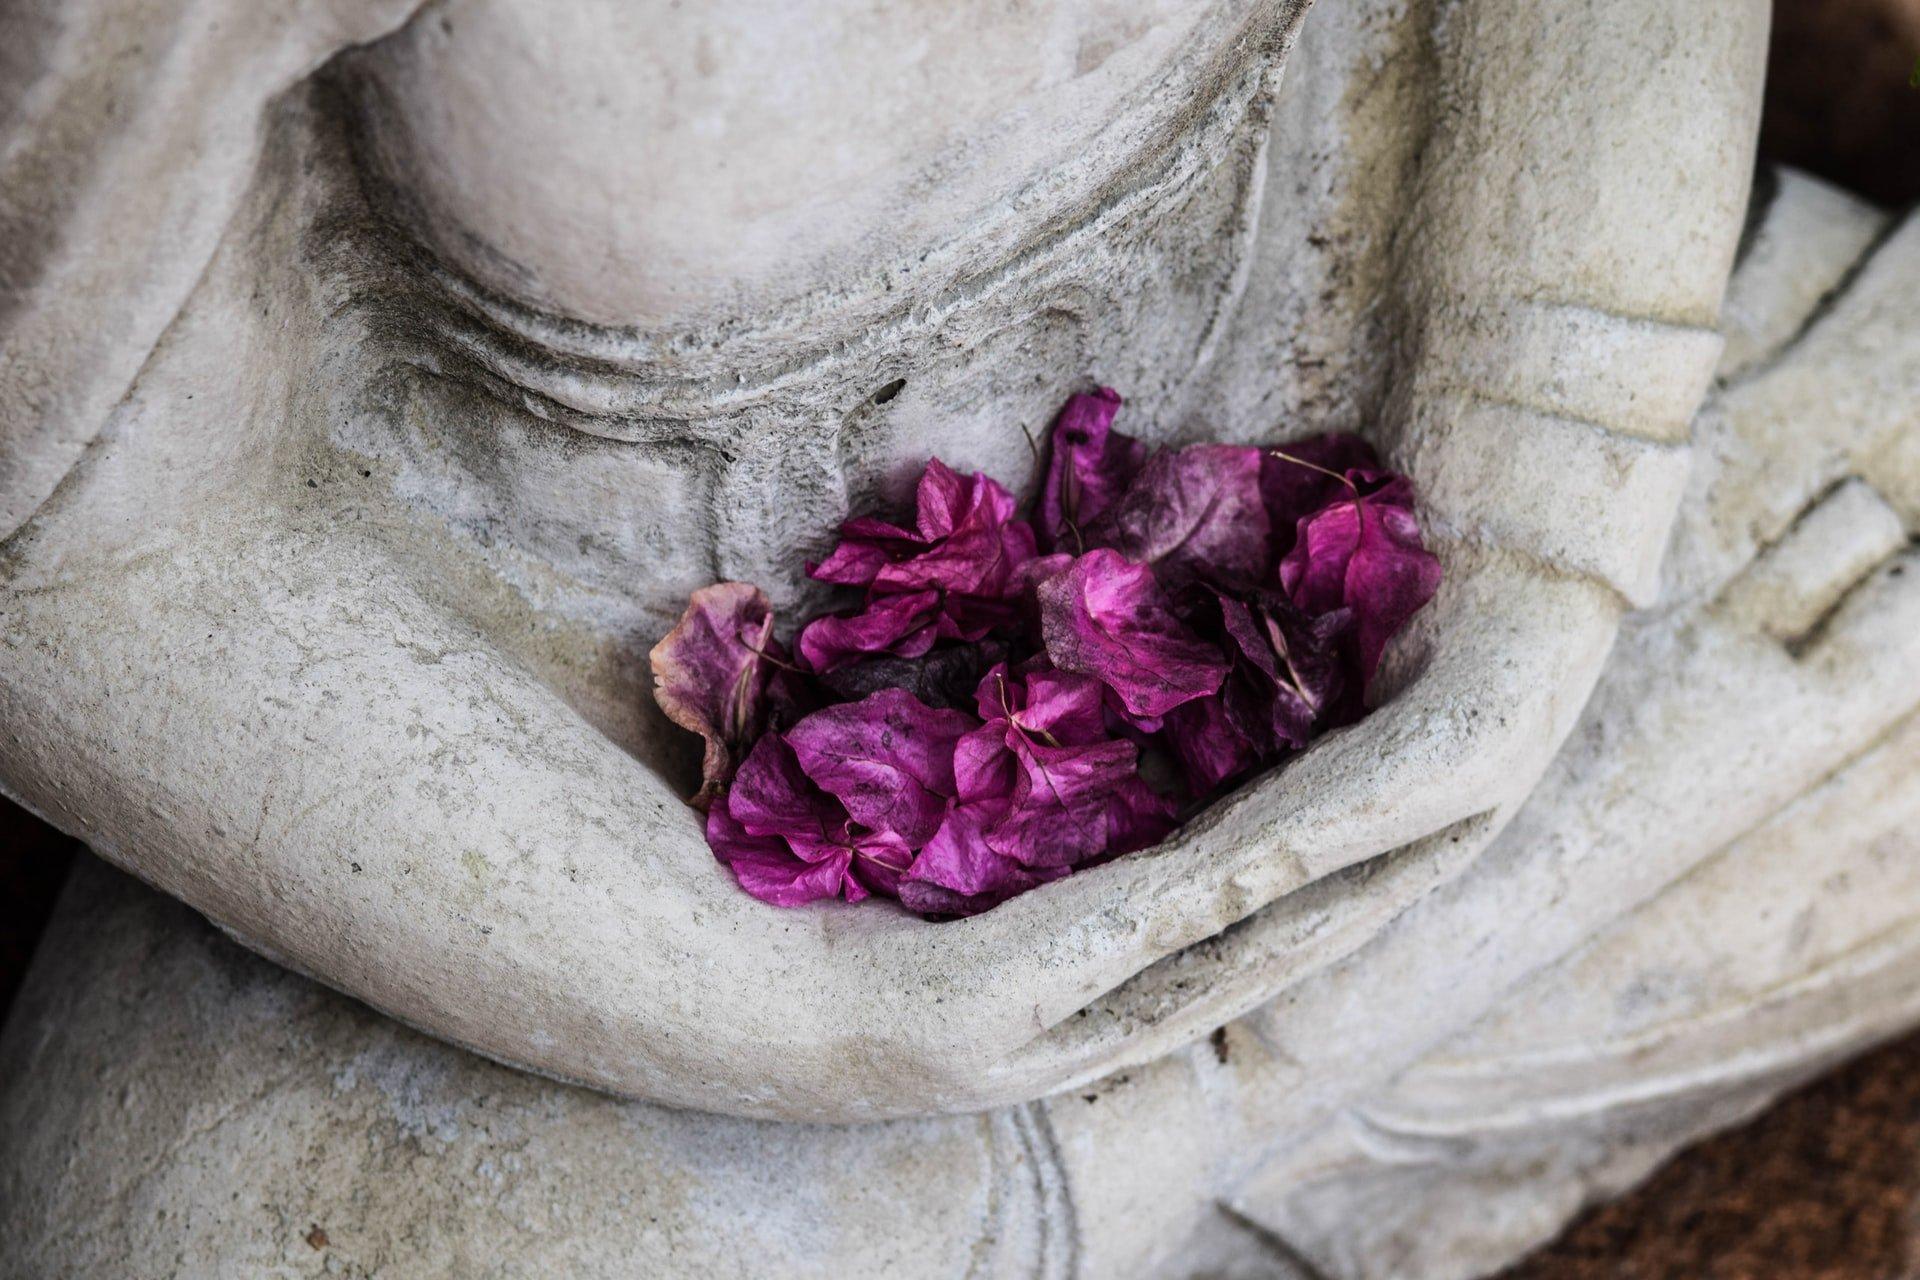 Statue holding flower petals